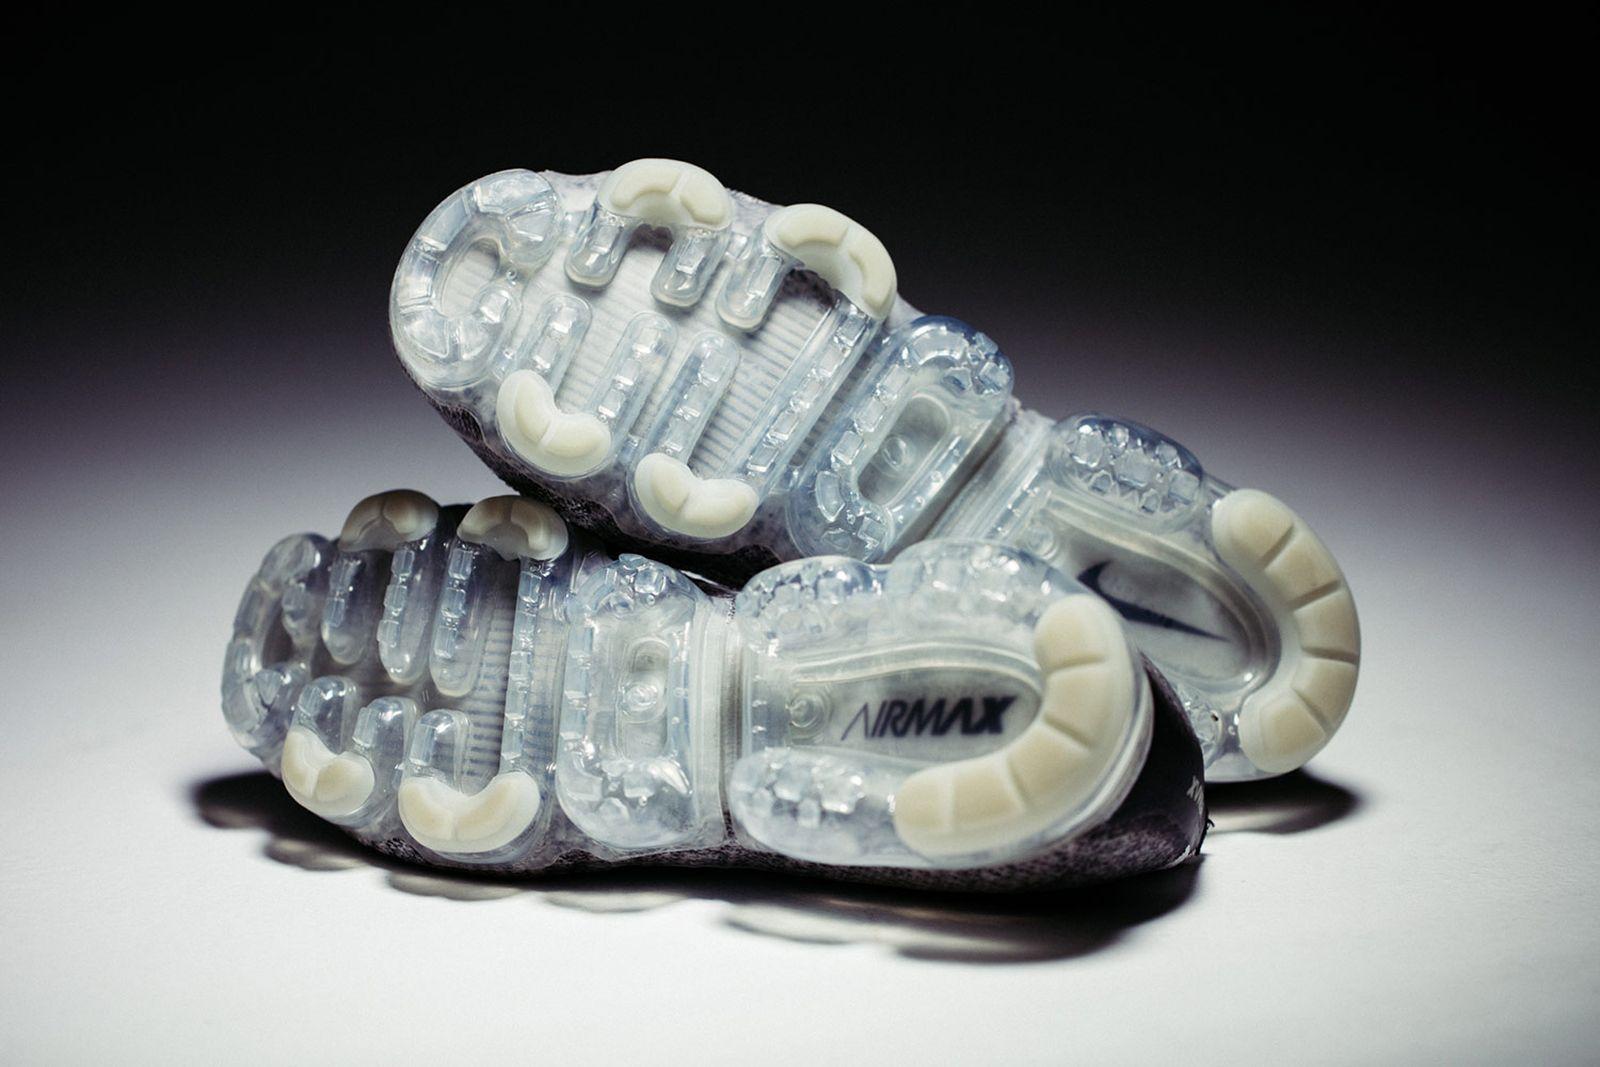 Nike-Vapormax-Highsnobiety-4-25-10